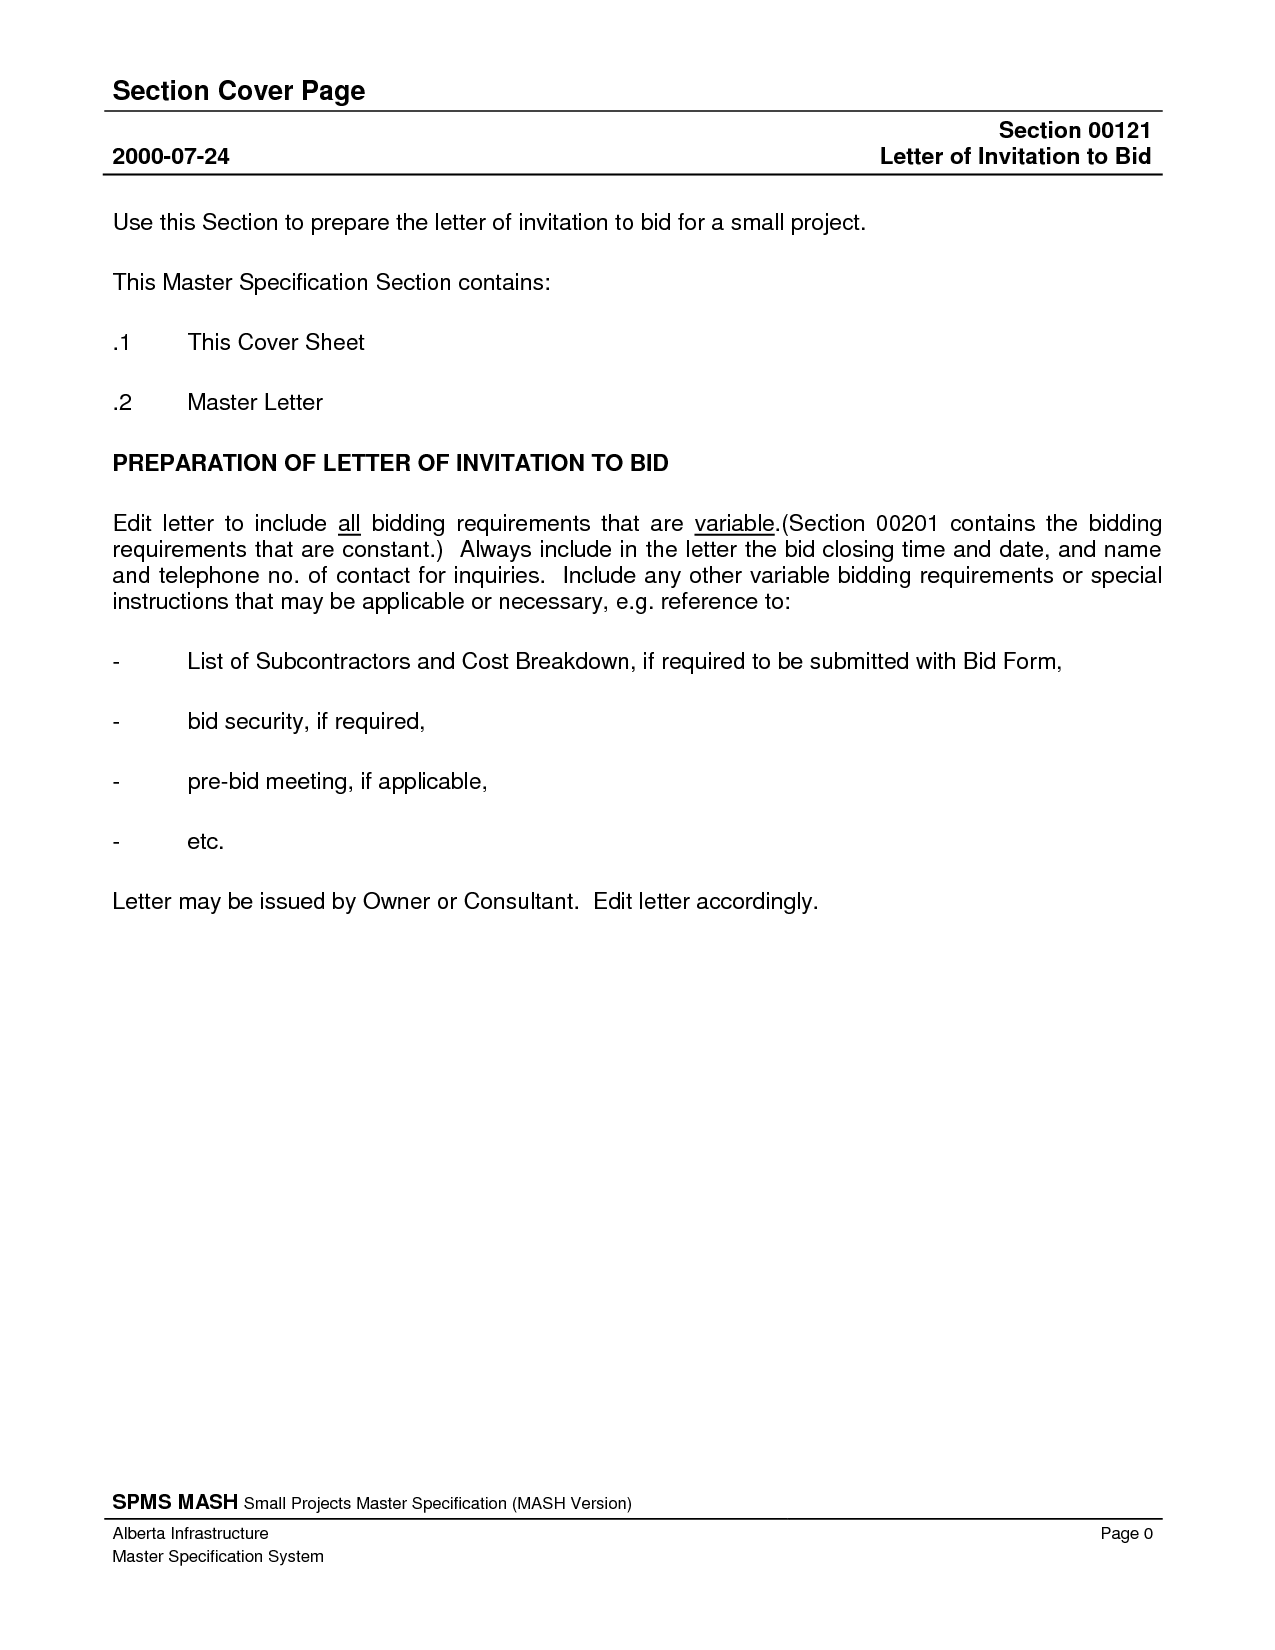 Invitation To Bid Sample Letter